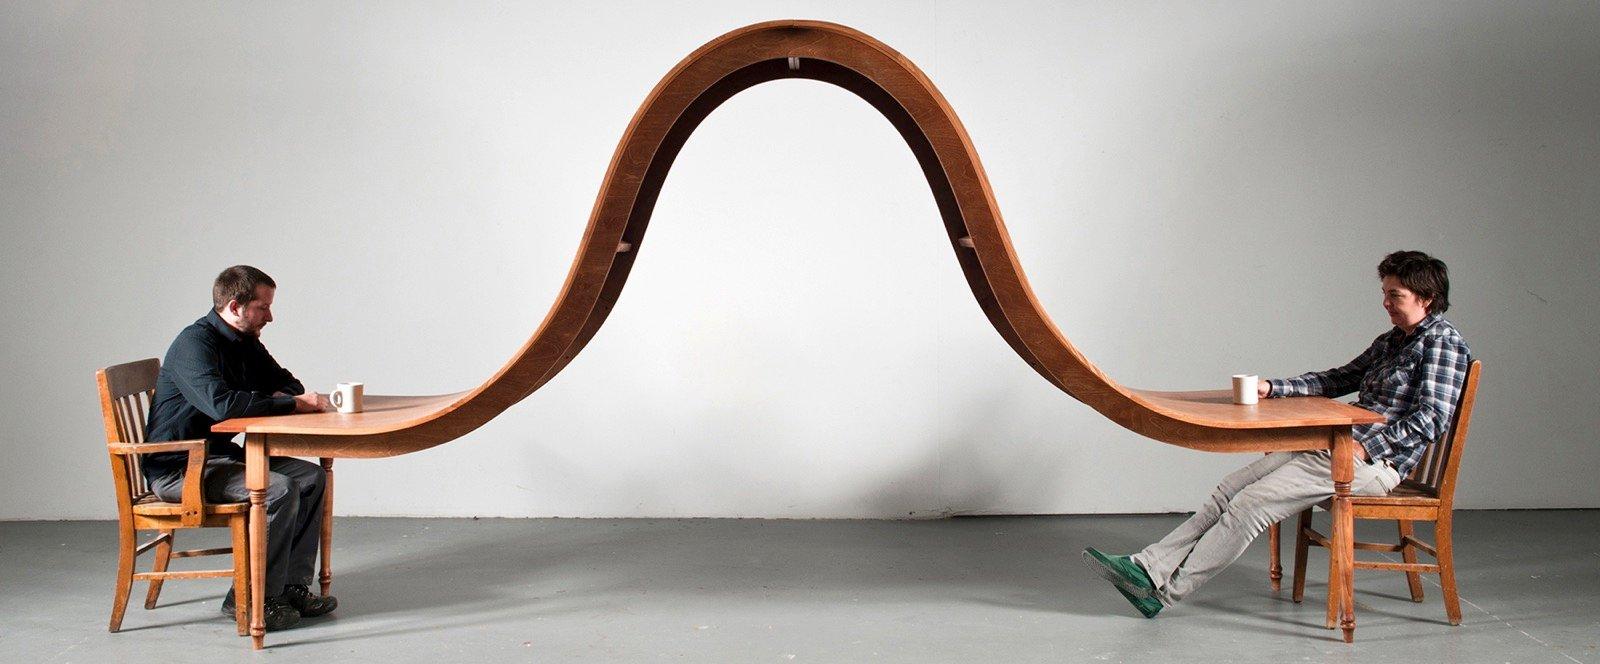 Michael beitz sculptural work designboom 1800